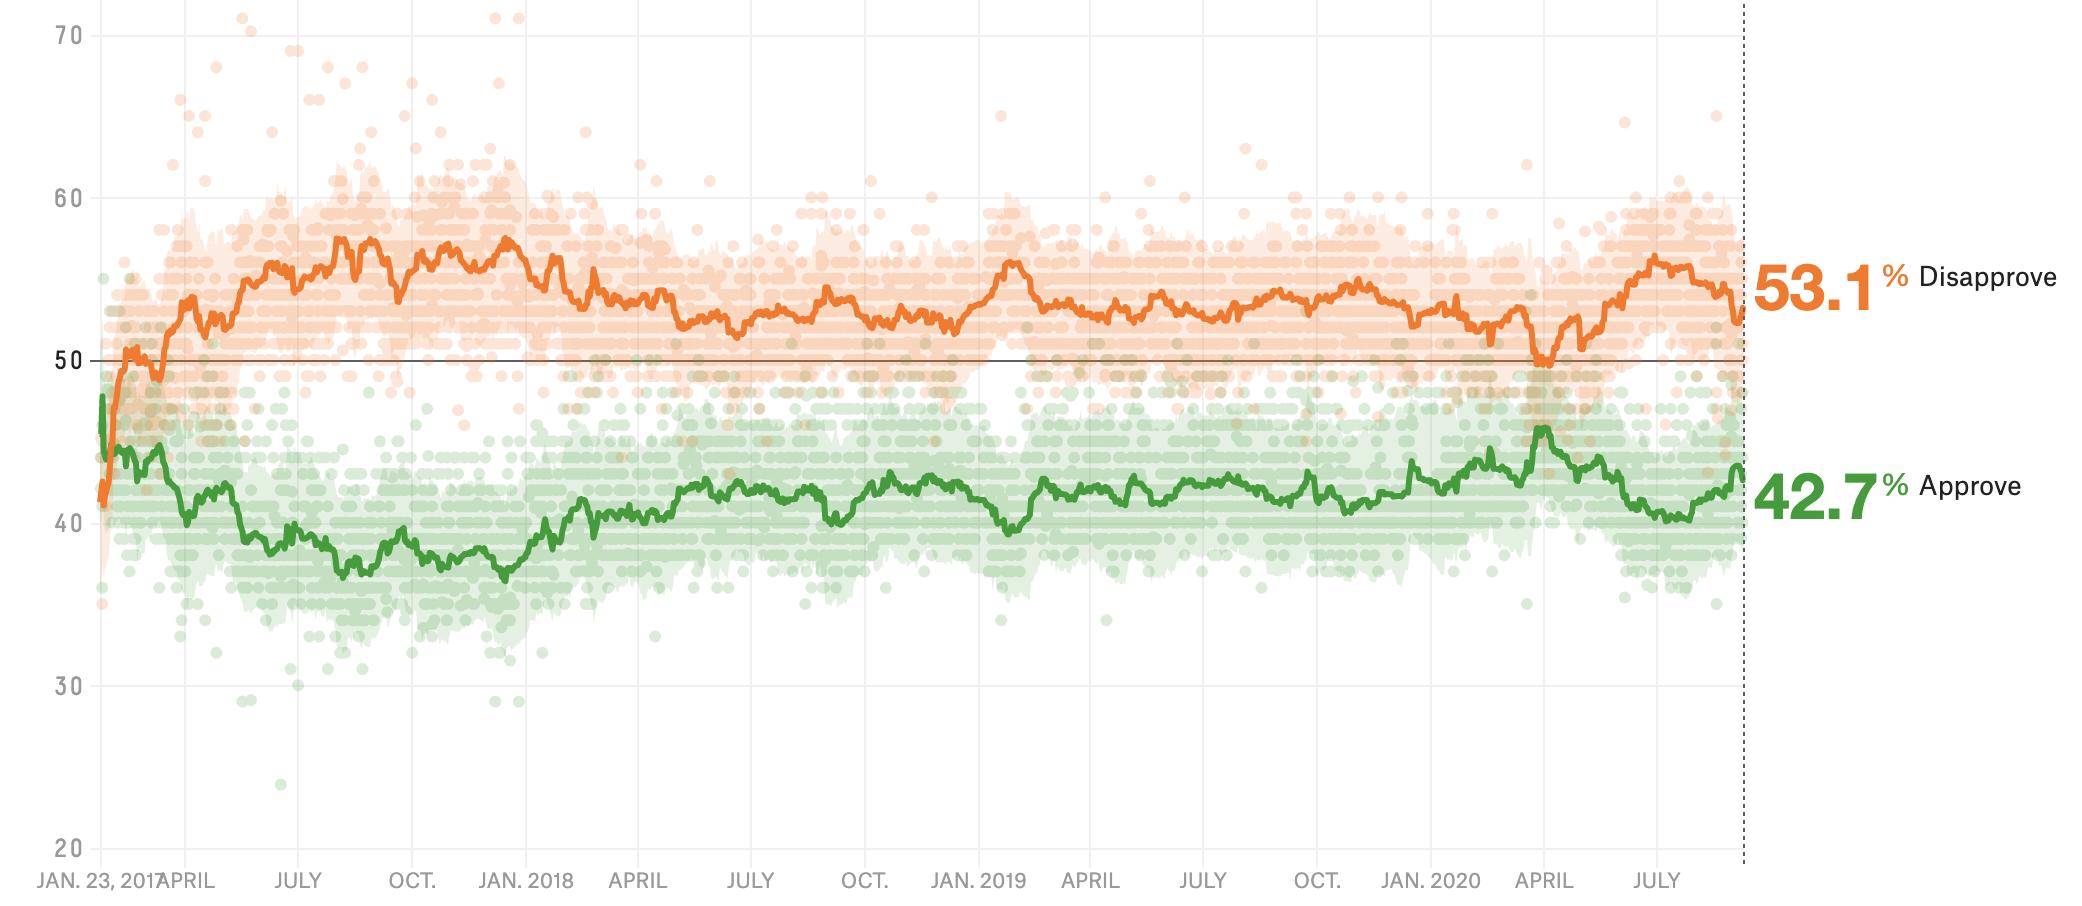 Trump And Biden Both Got Small Convention Bounces. But Only Biden Got More Popular. 1